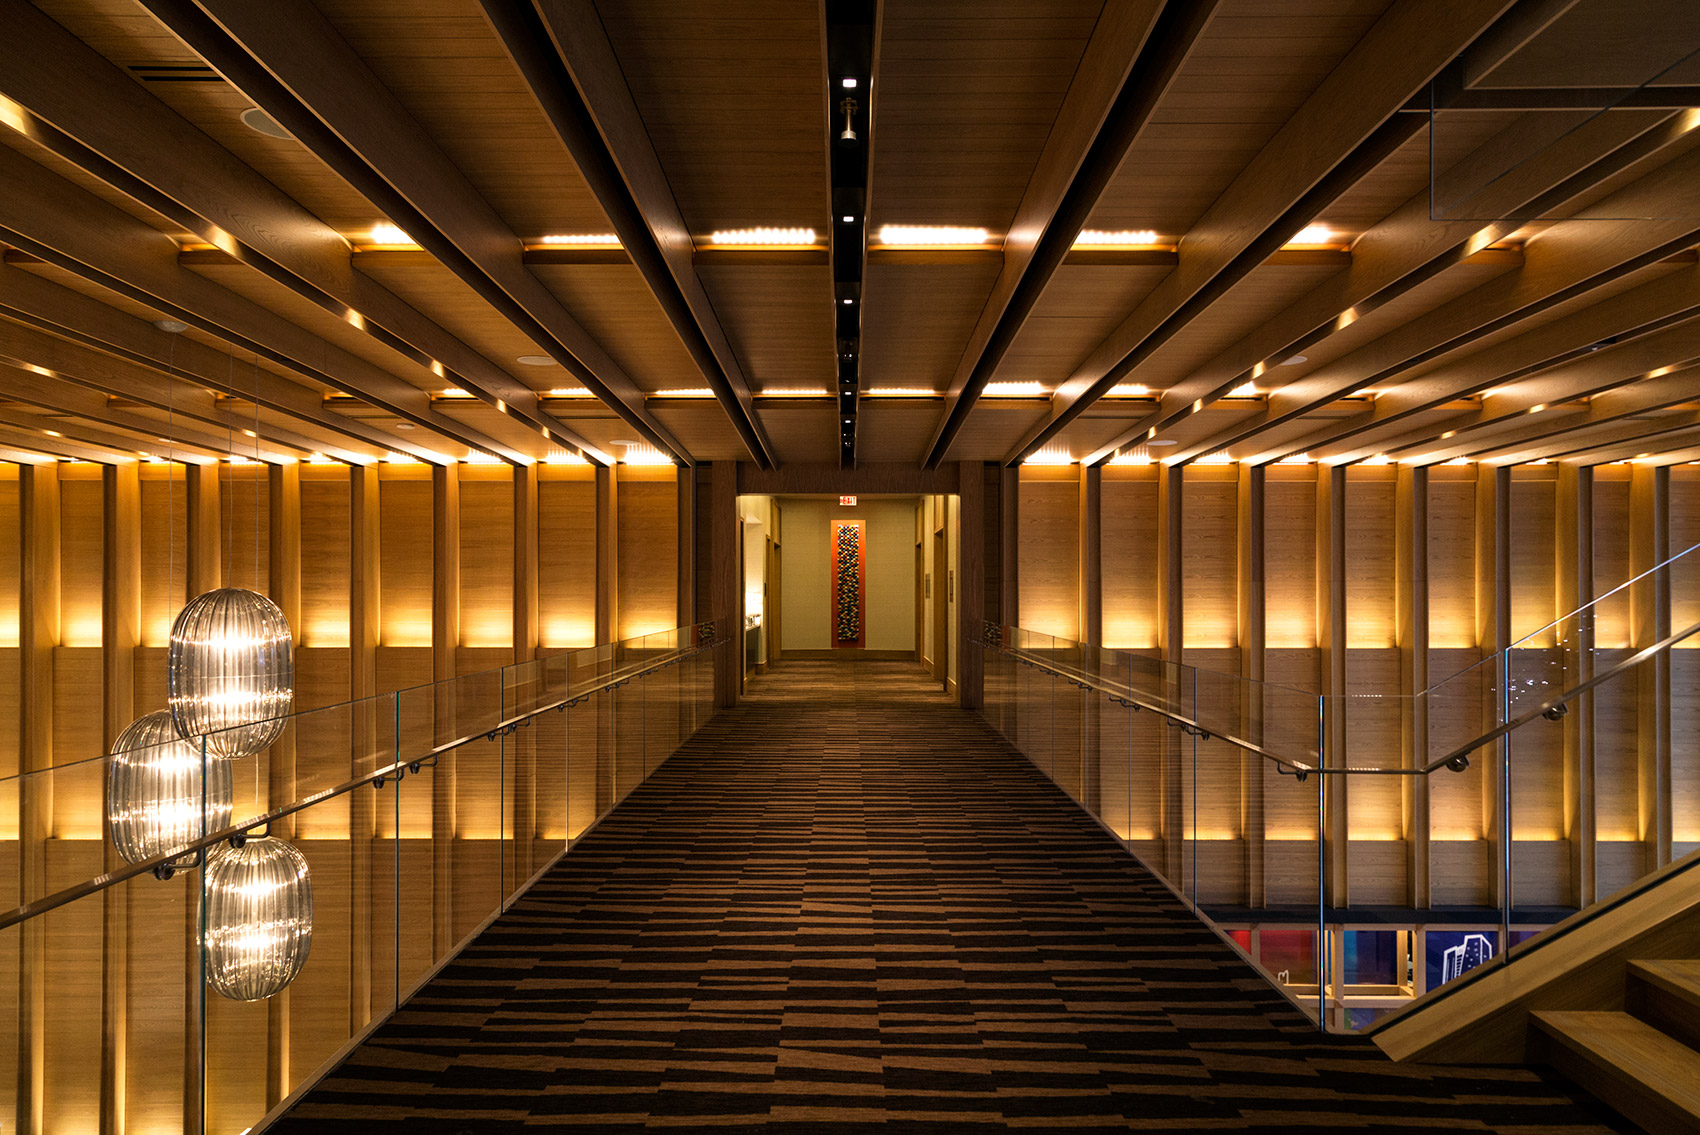 20141126. Gawking at Delta Toronto's stunning hotel lobby from t